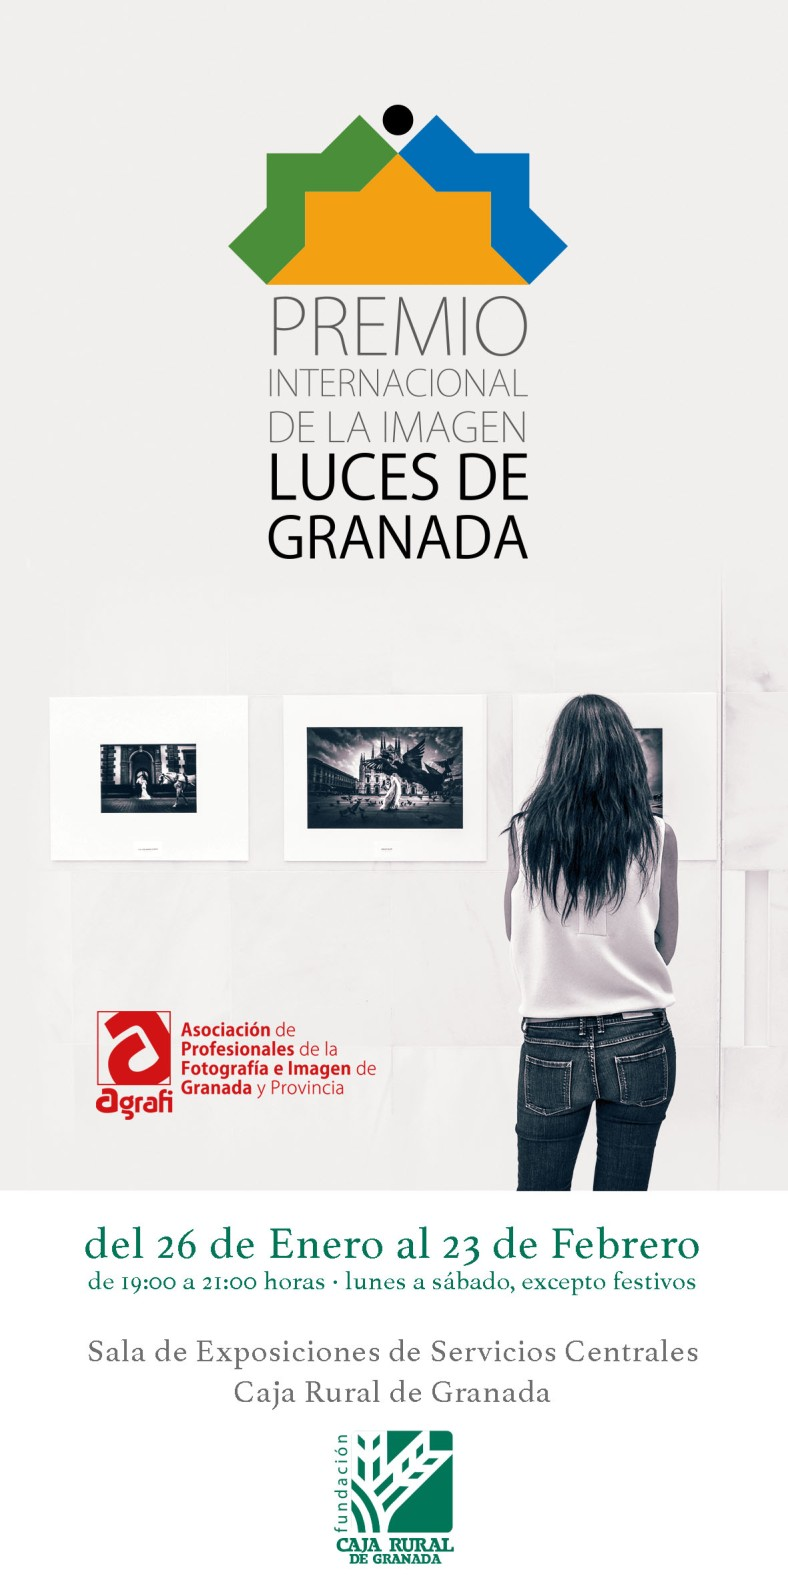 Expo Luces de Granada